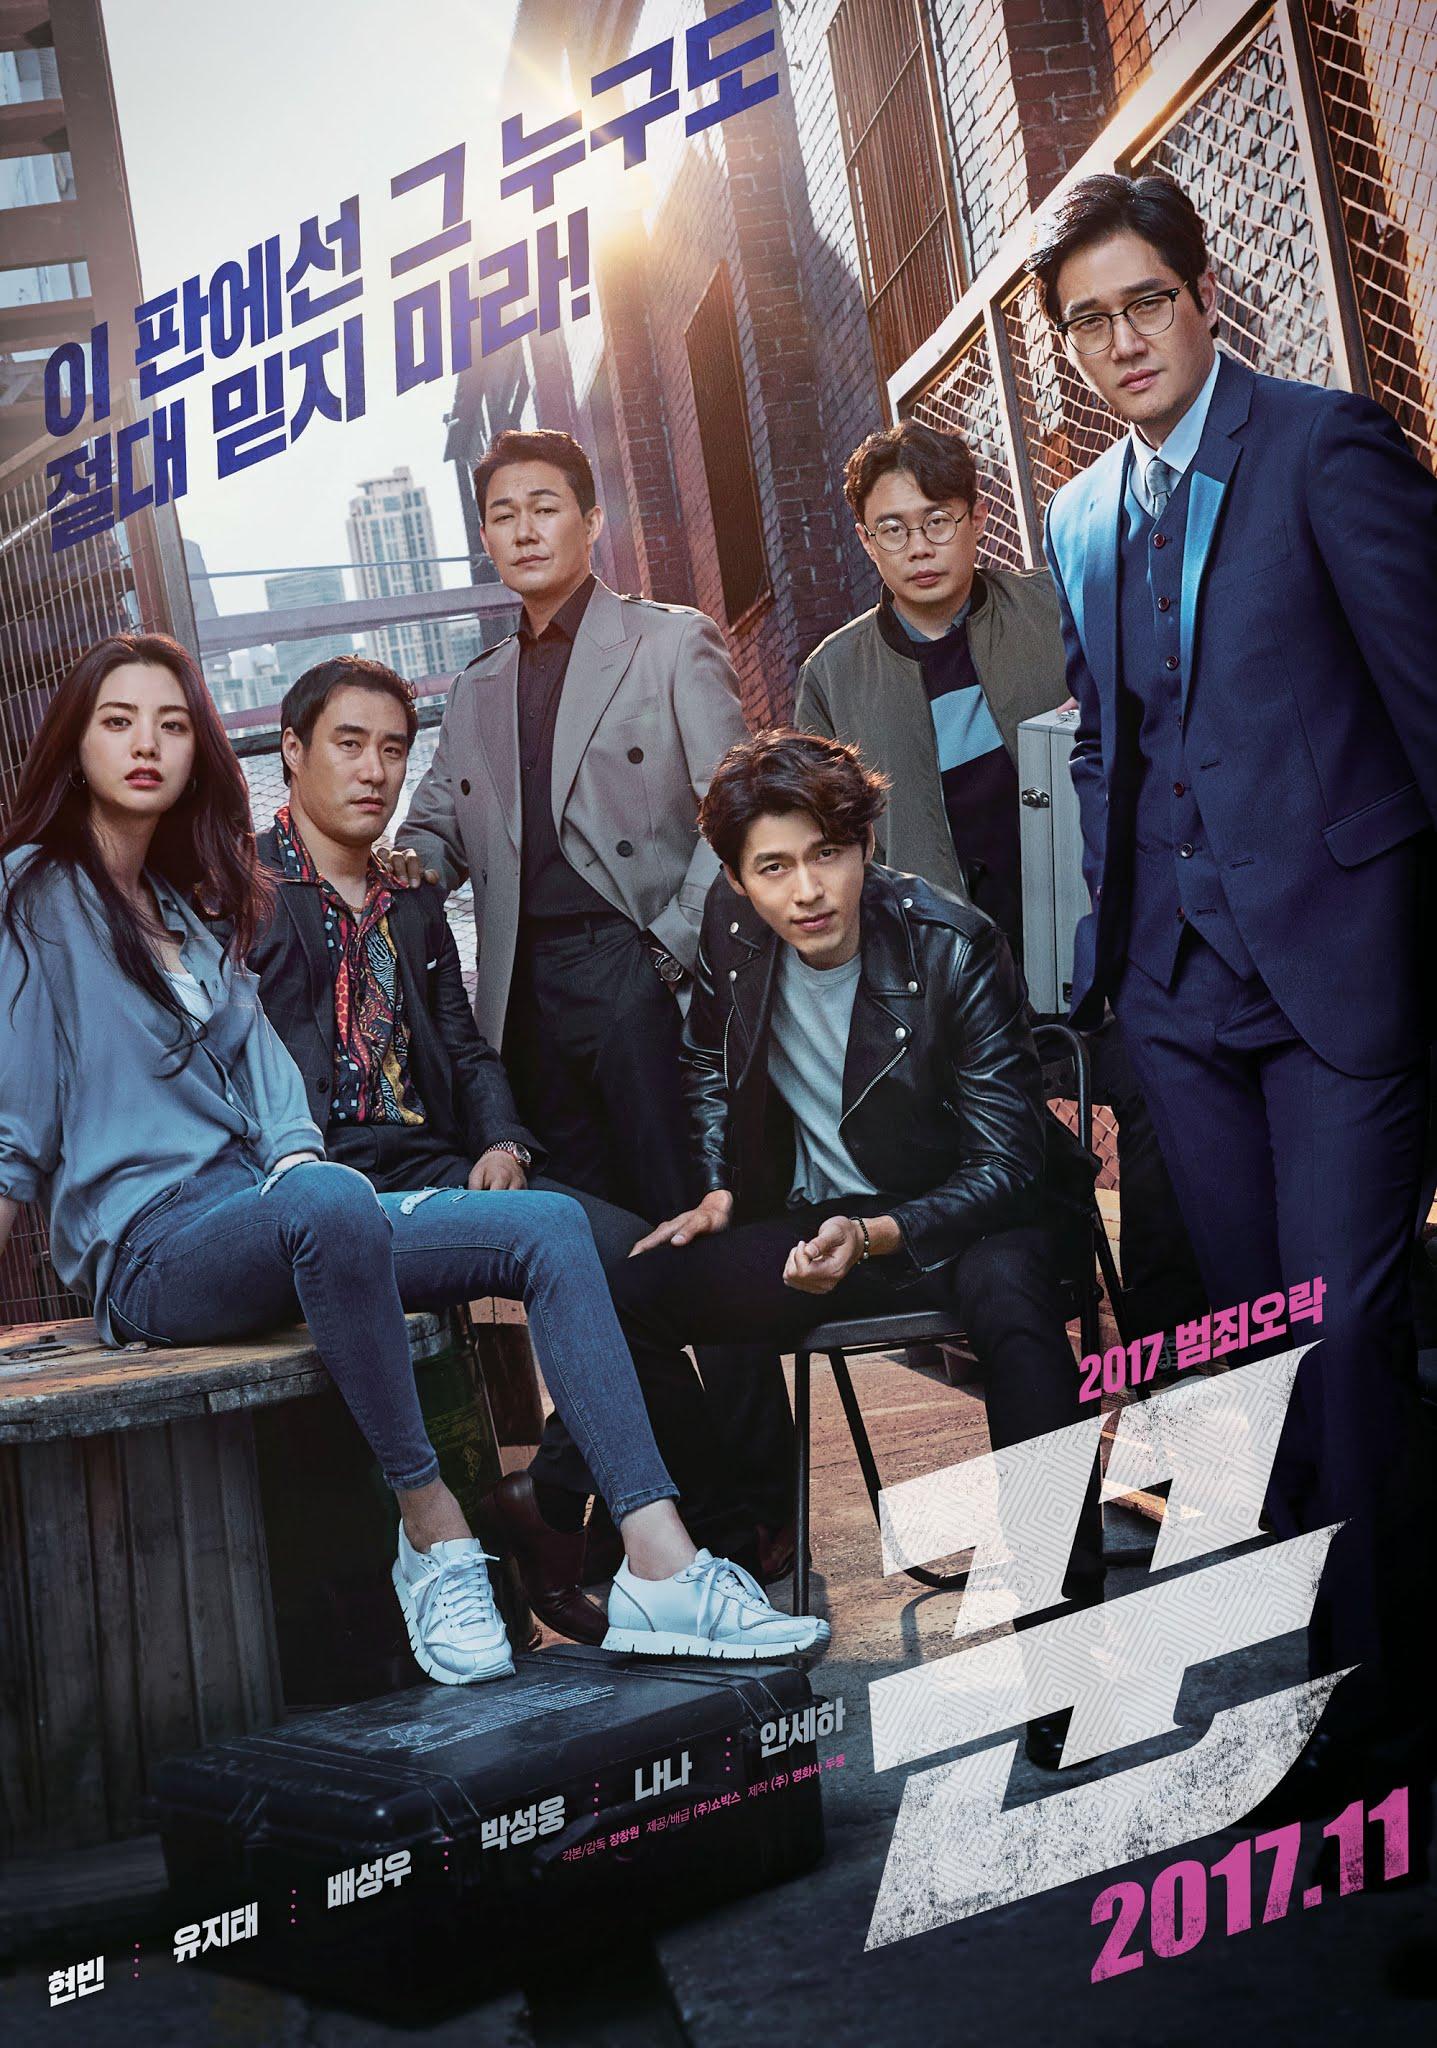 Tonton Korean Movie The Swindlers (Starring Hyun Bin)